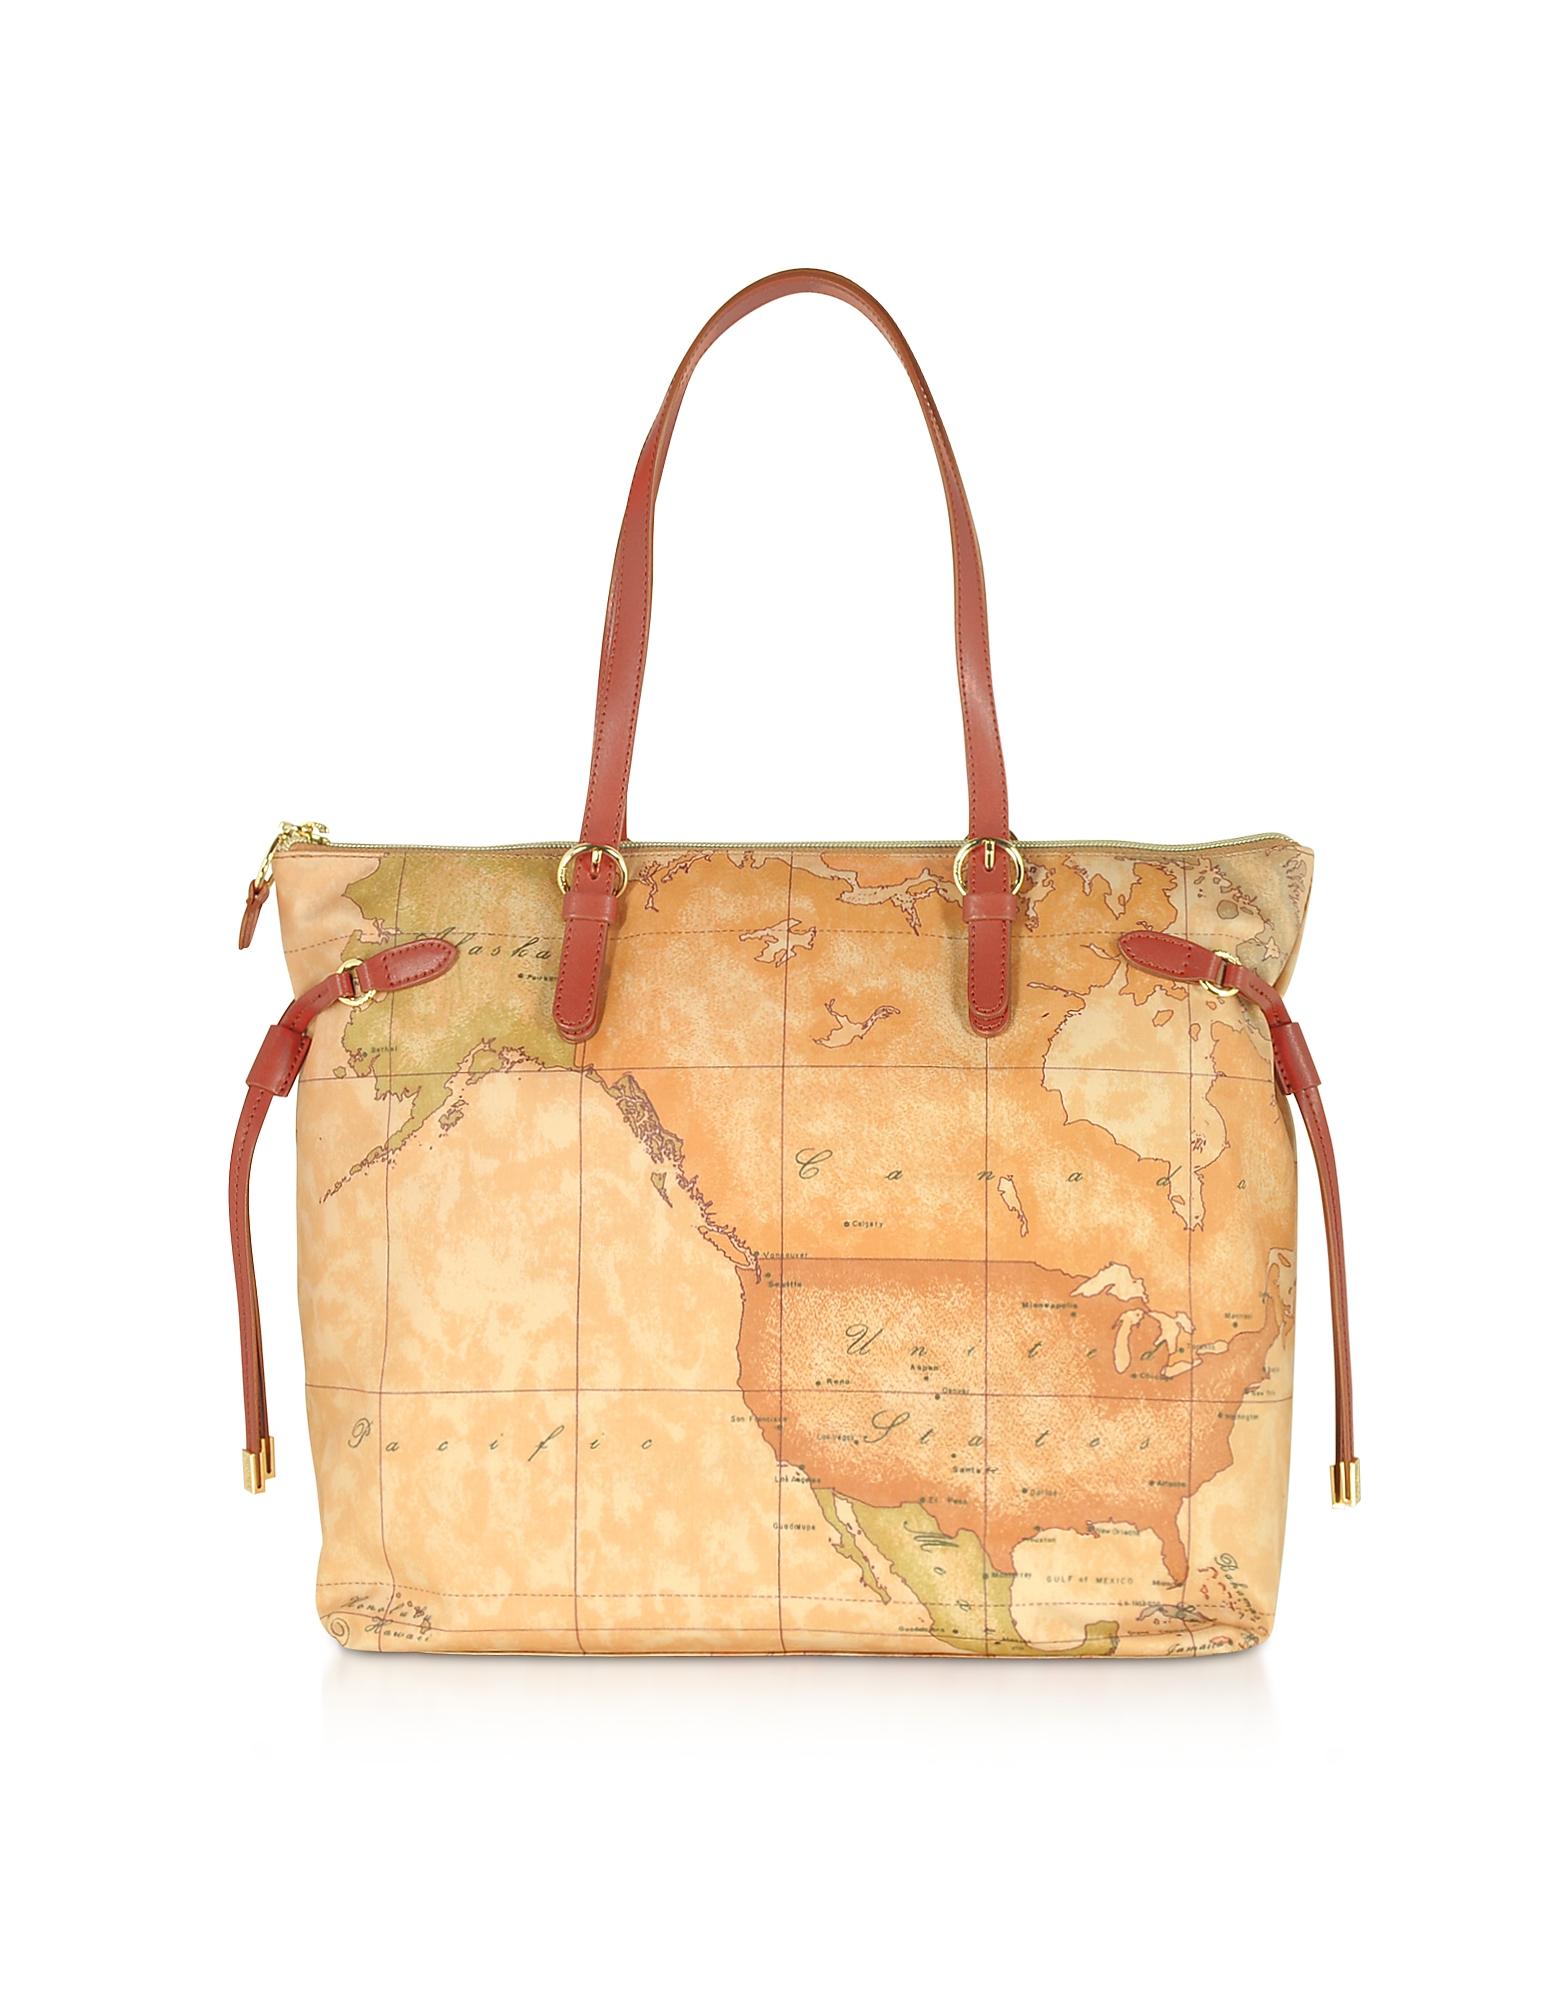 Alviero Martini 1A Classe Designer Handbags, Soft Geo Classic and Leather Tote Bag